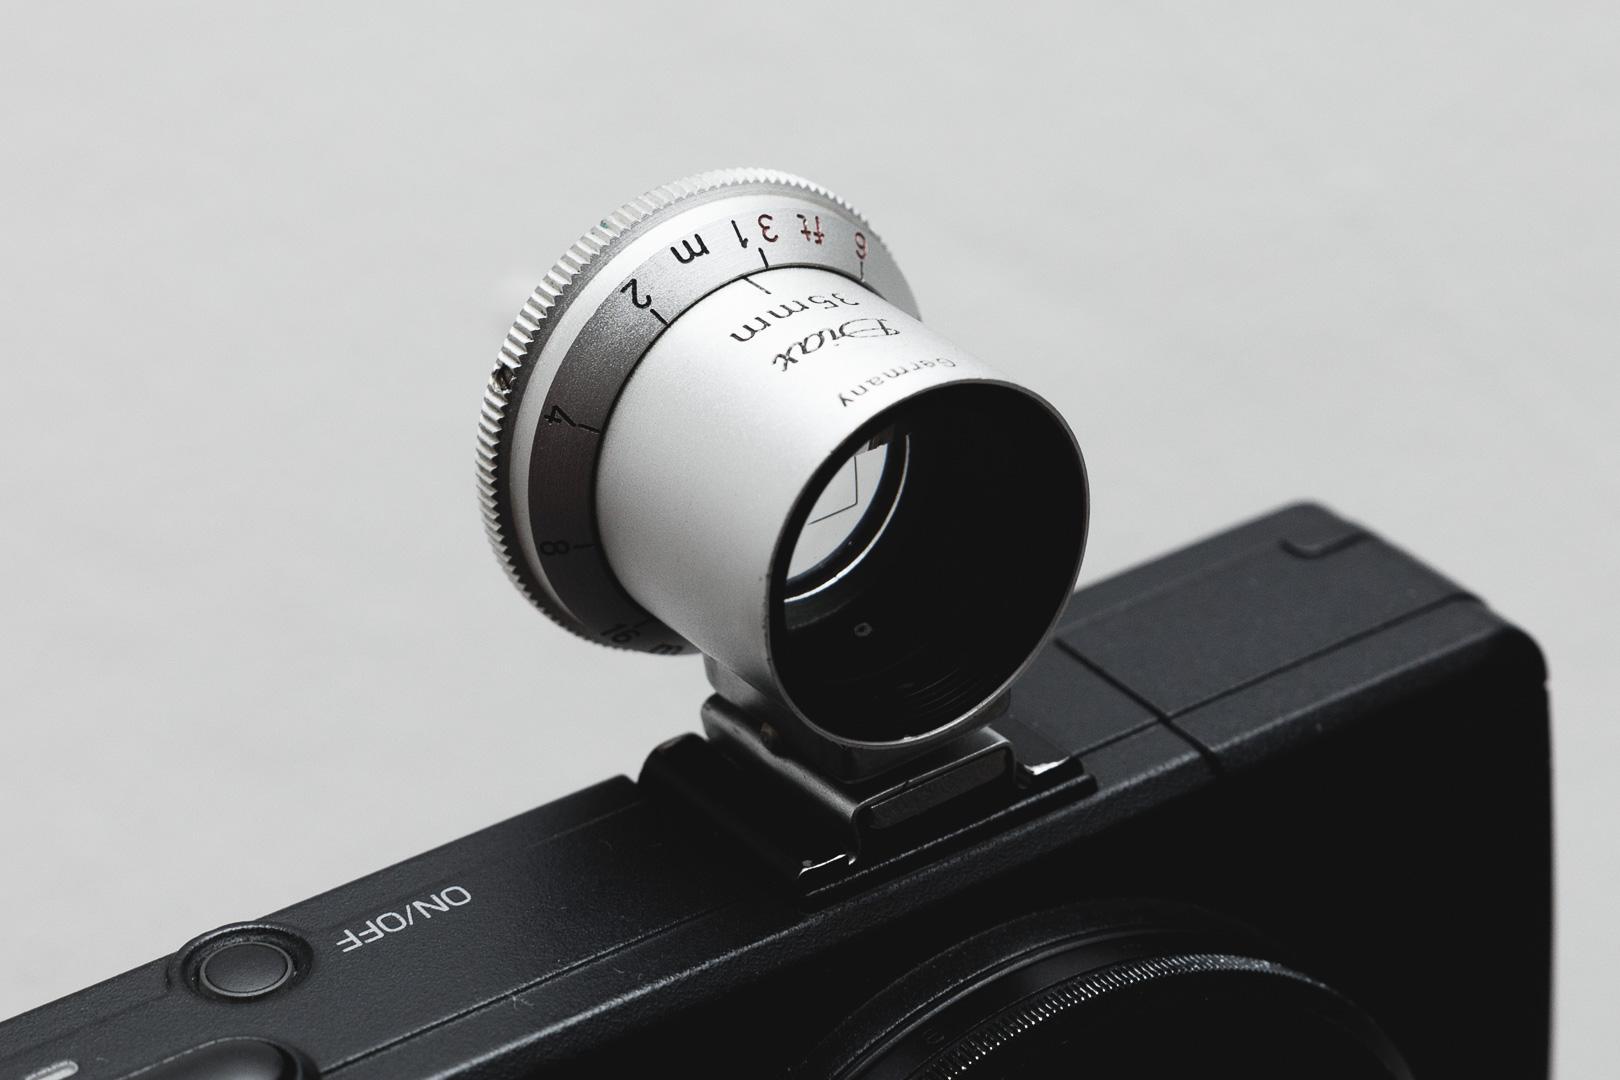 Diax-35mm-finder-Ant Tran-20170402-2967.jpg